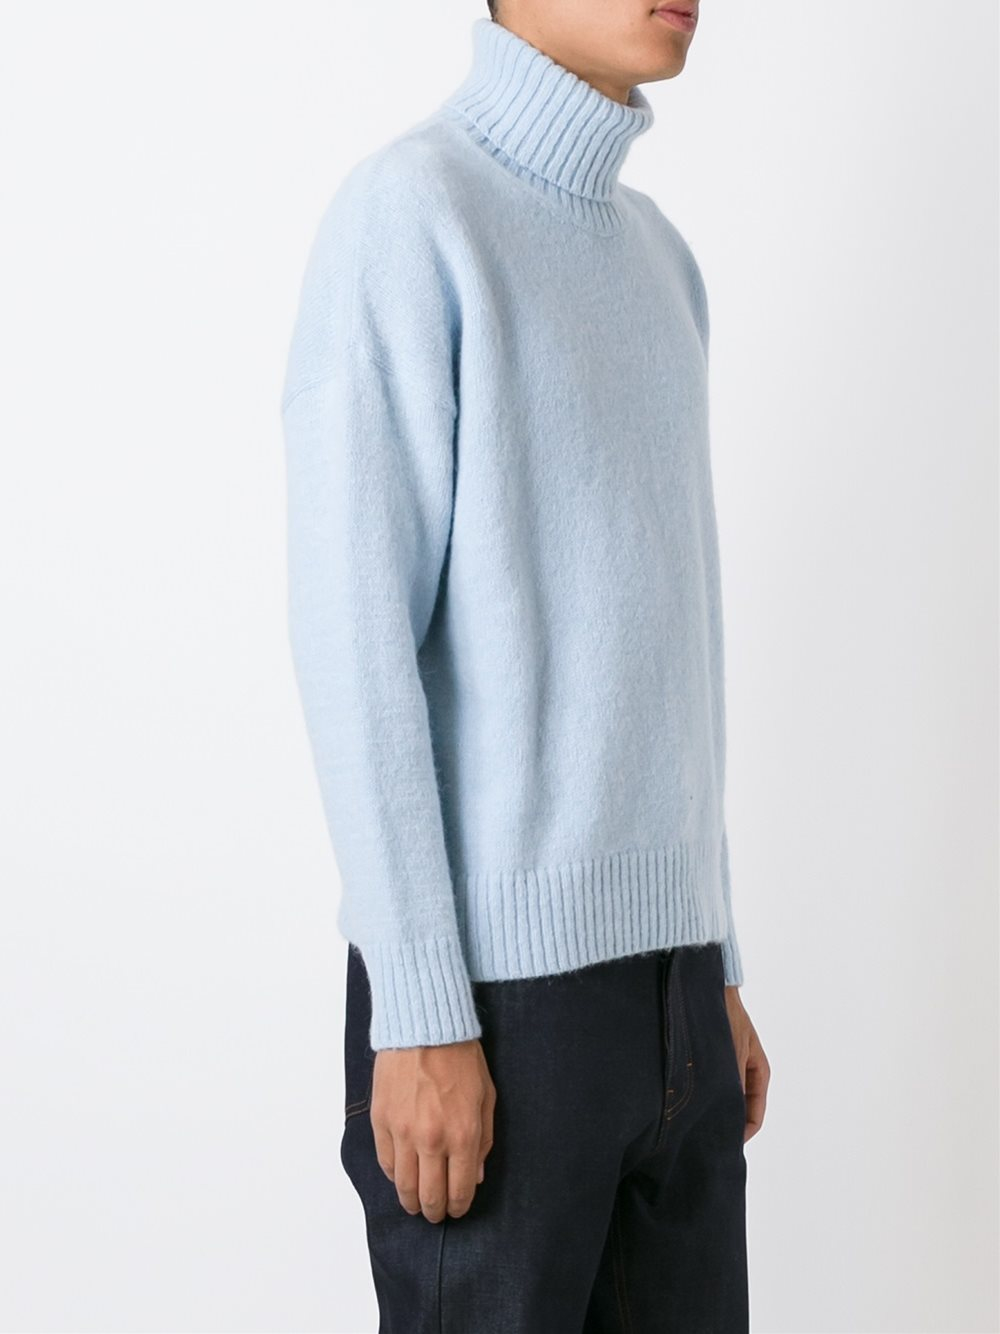 Lyst Ami Blue Alpaca Oversized Turtleneck In Blue For Men